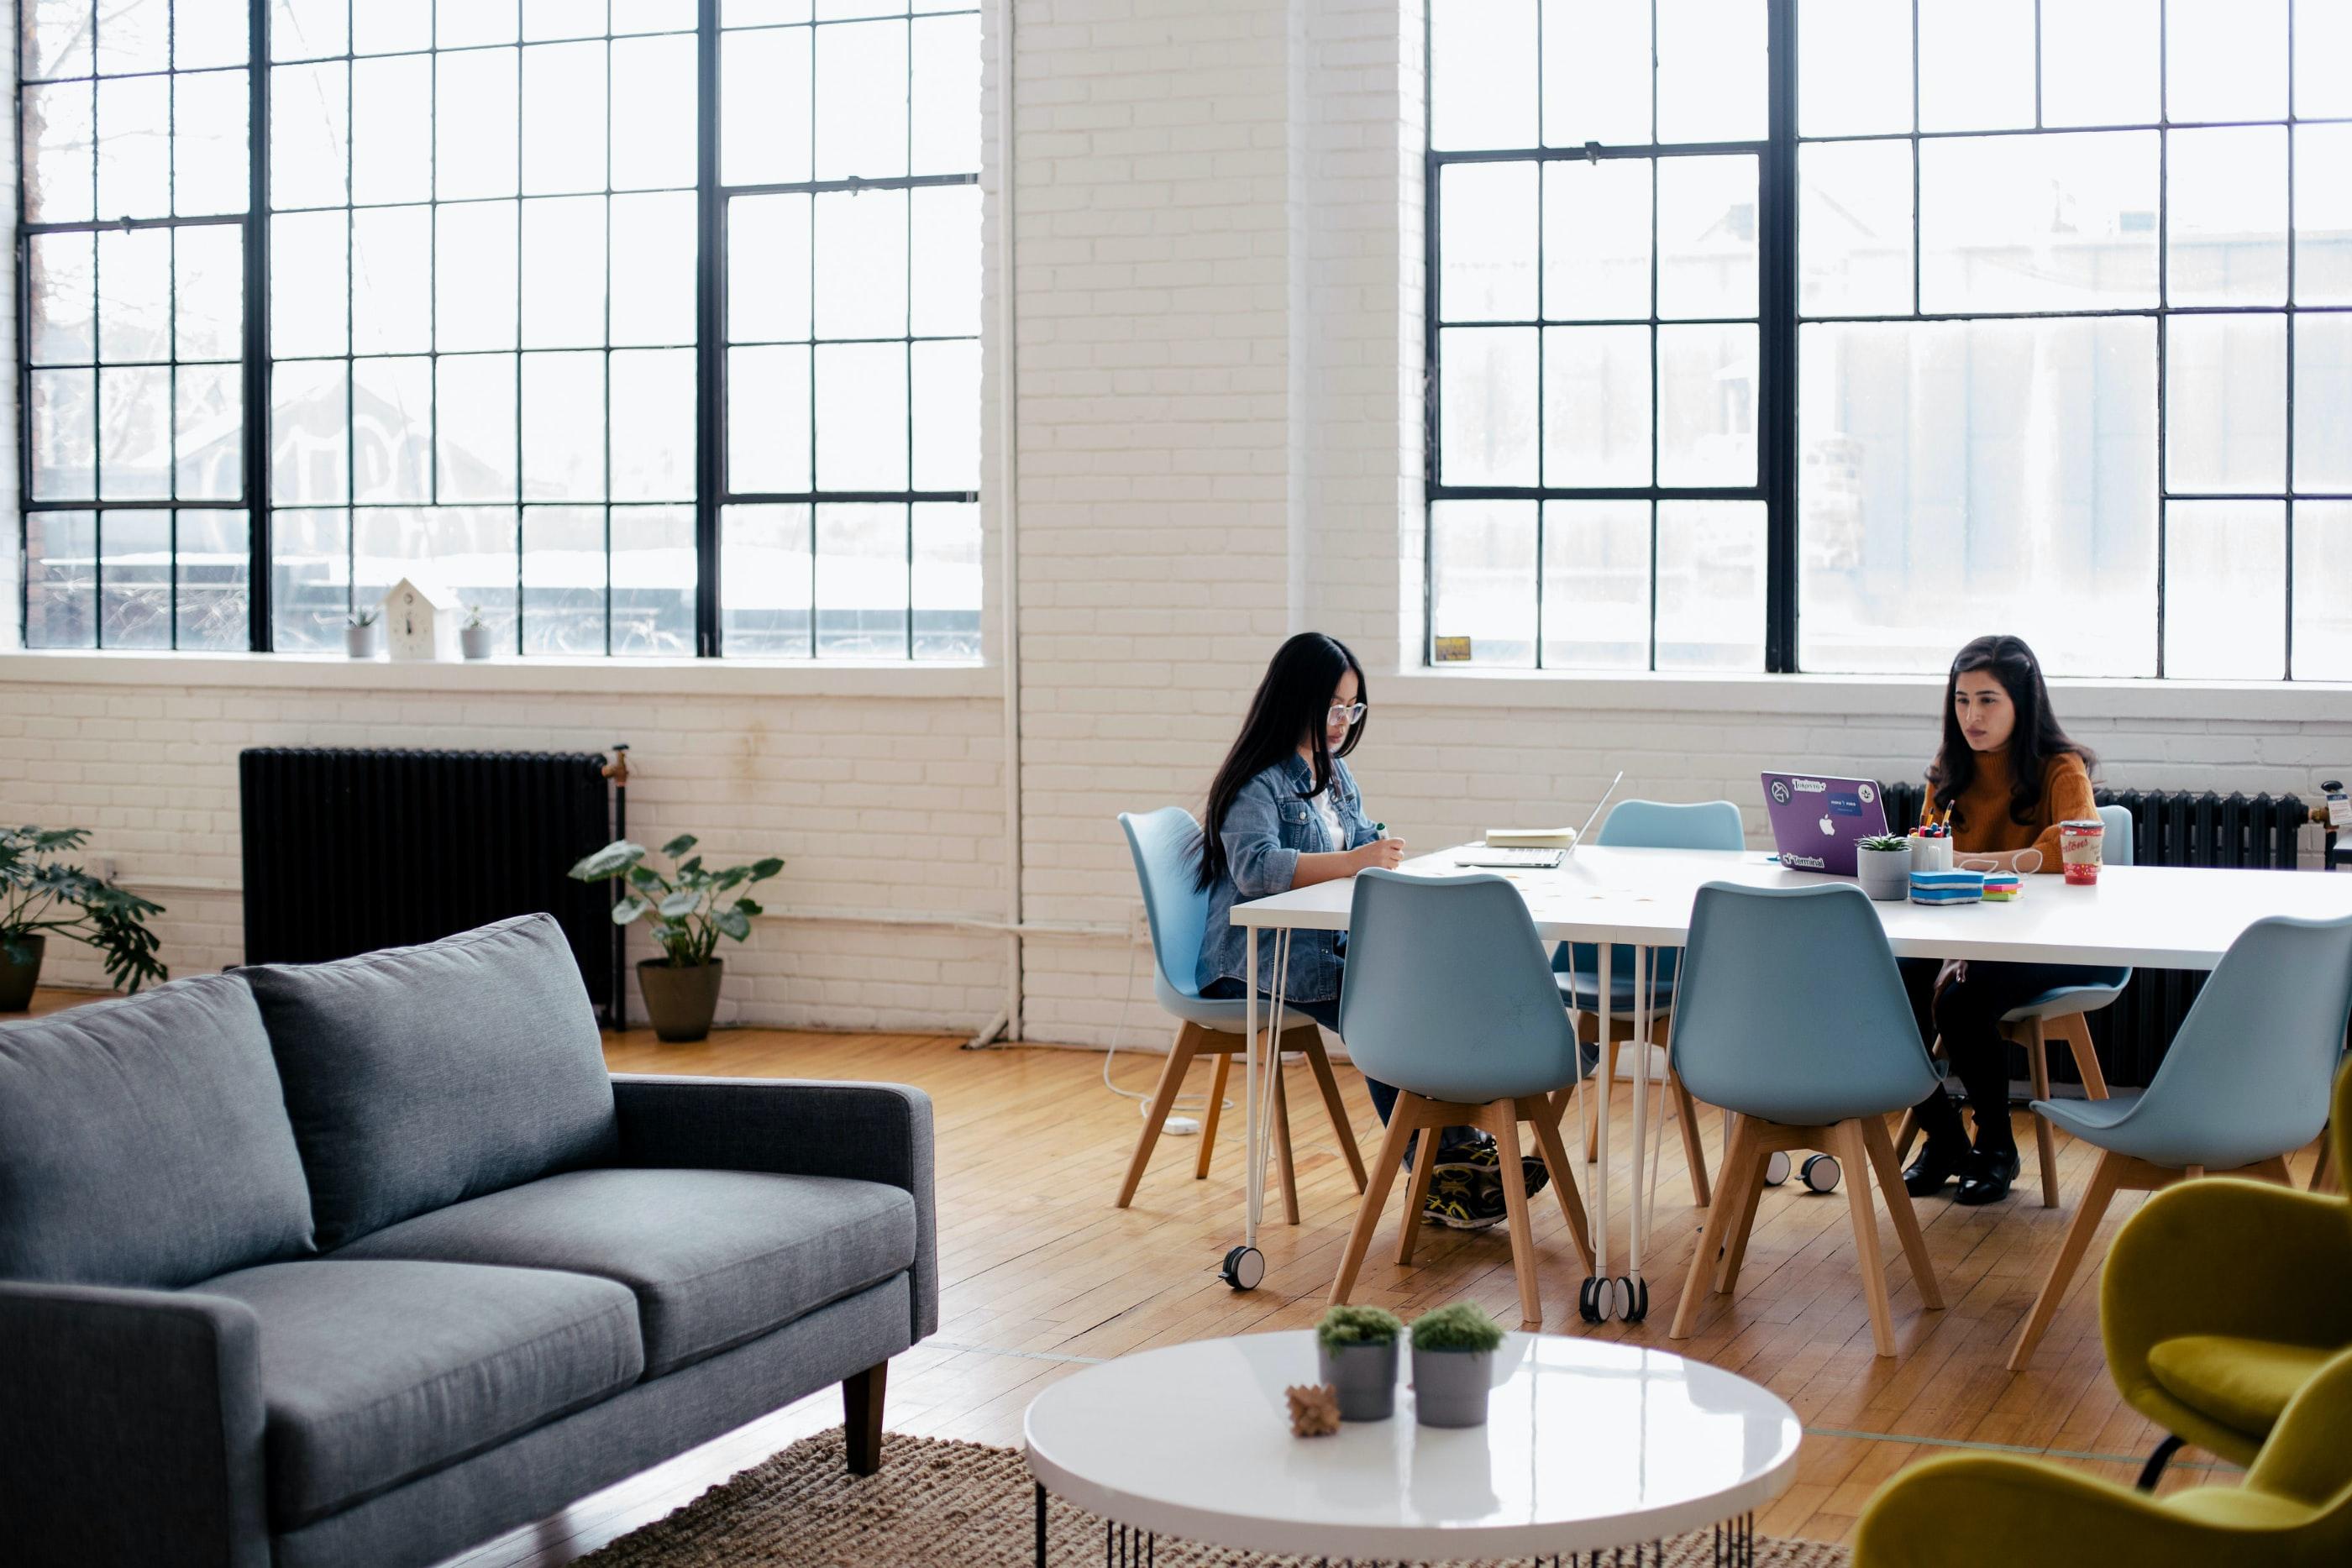 Top 5 Benefits Desired by Millennials and Gen Z Employees